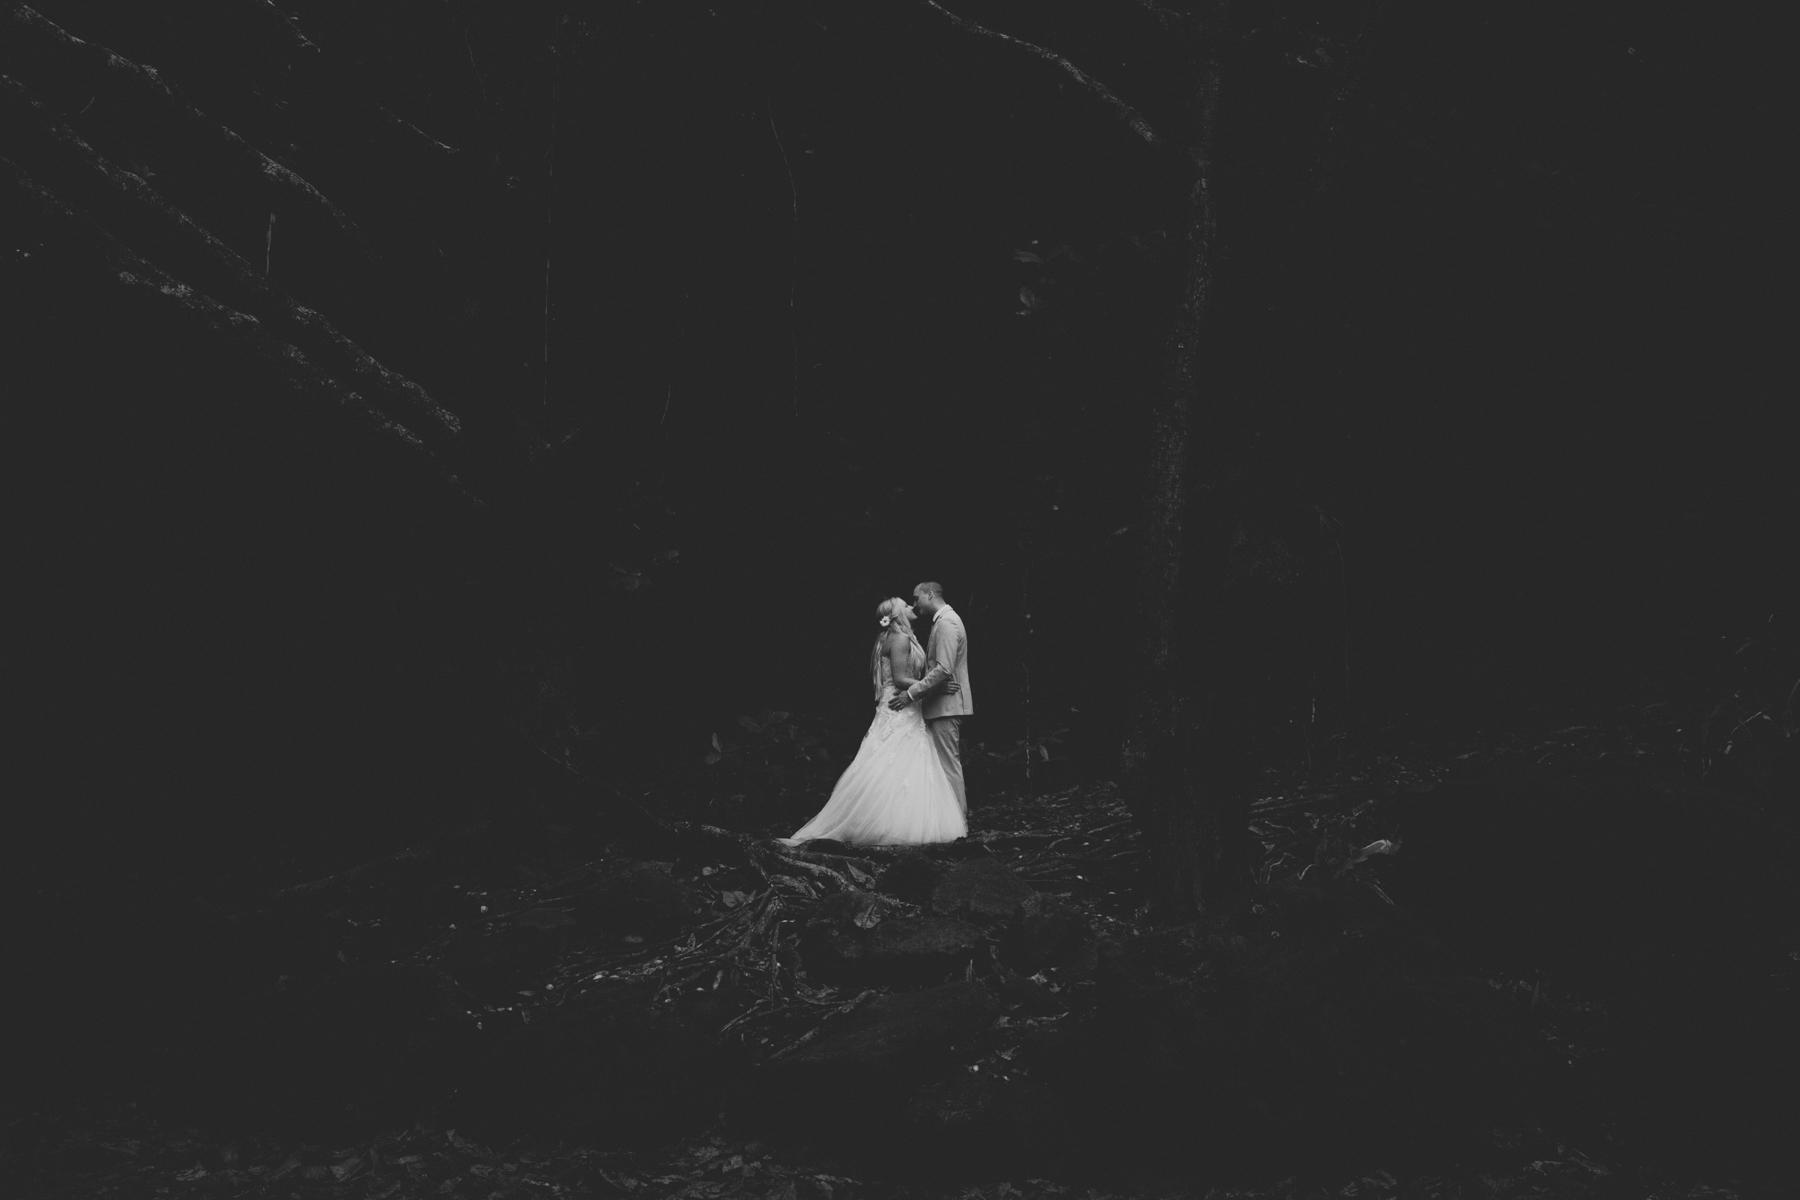 Hawaii Wedding Photographer @Anne-Claire Brun 001-2